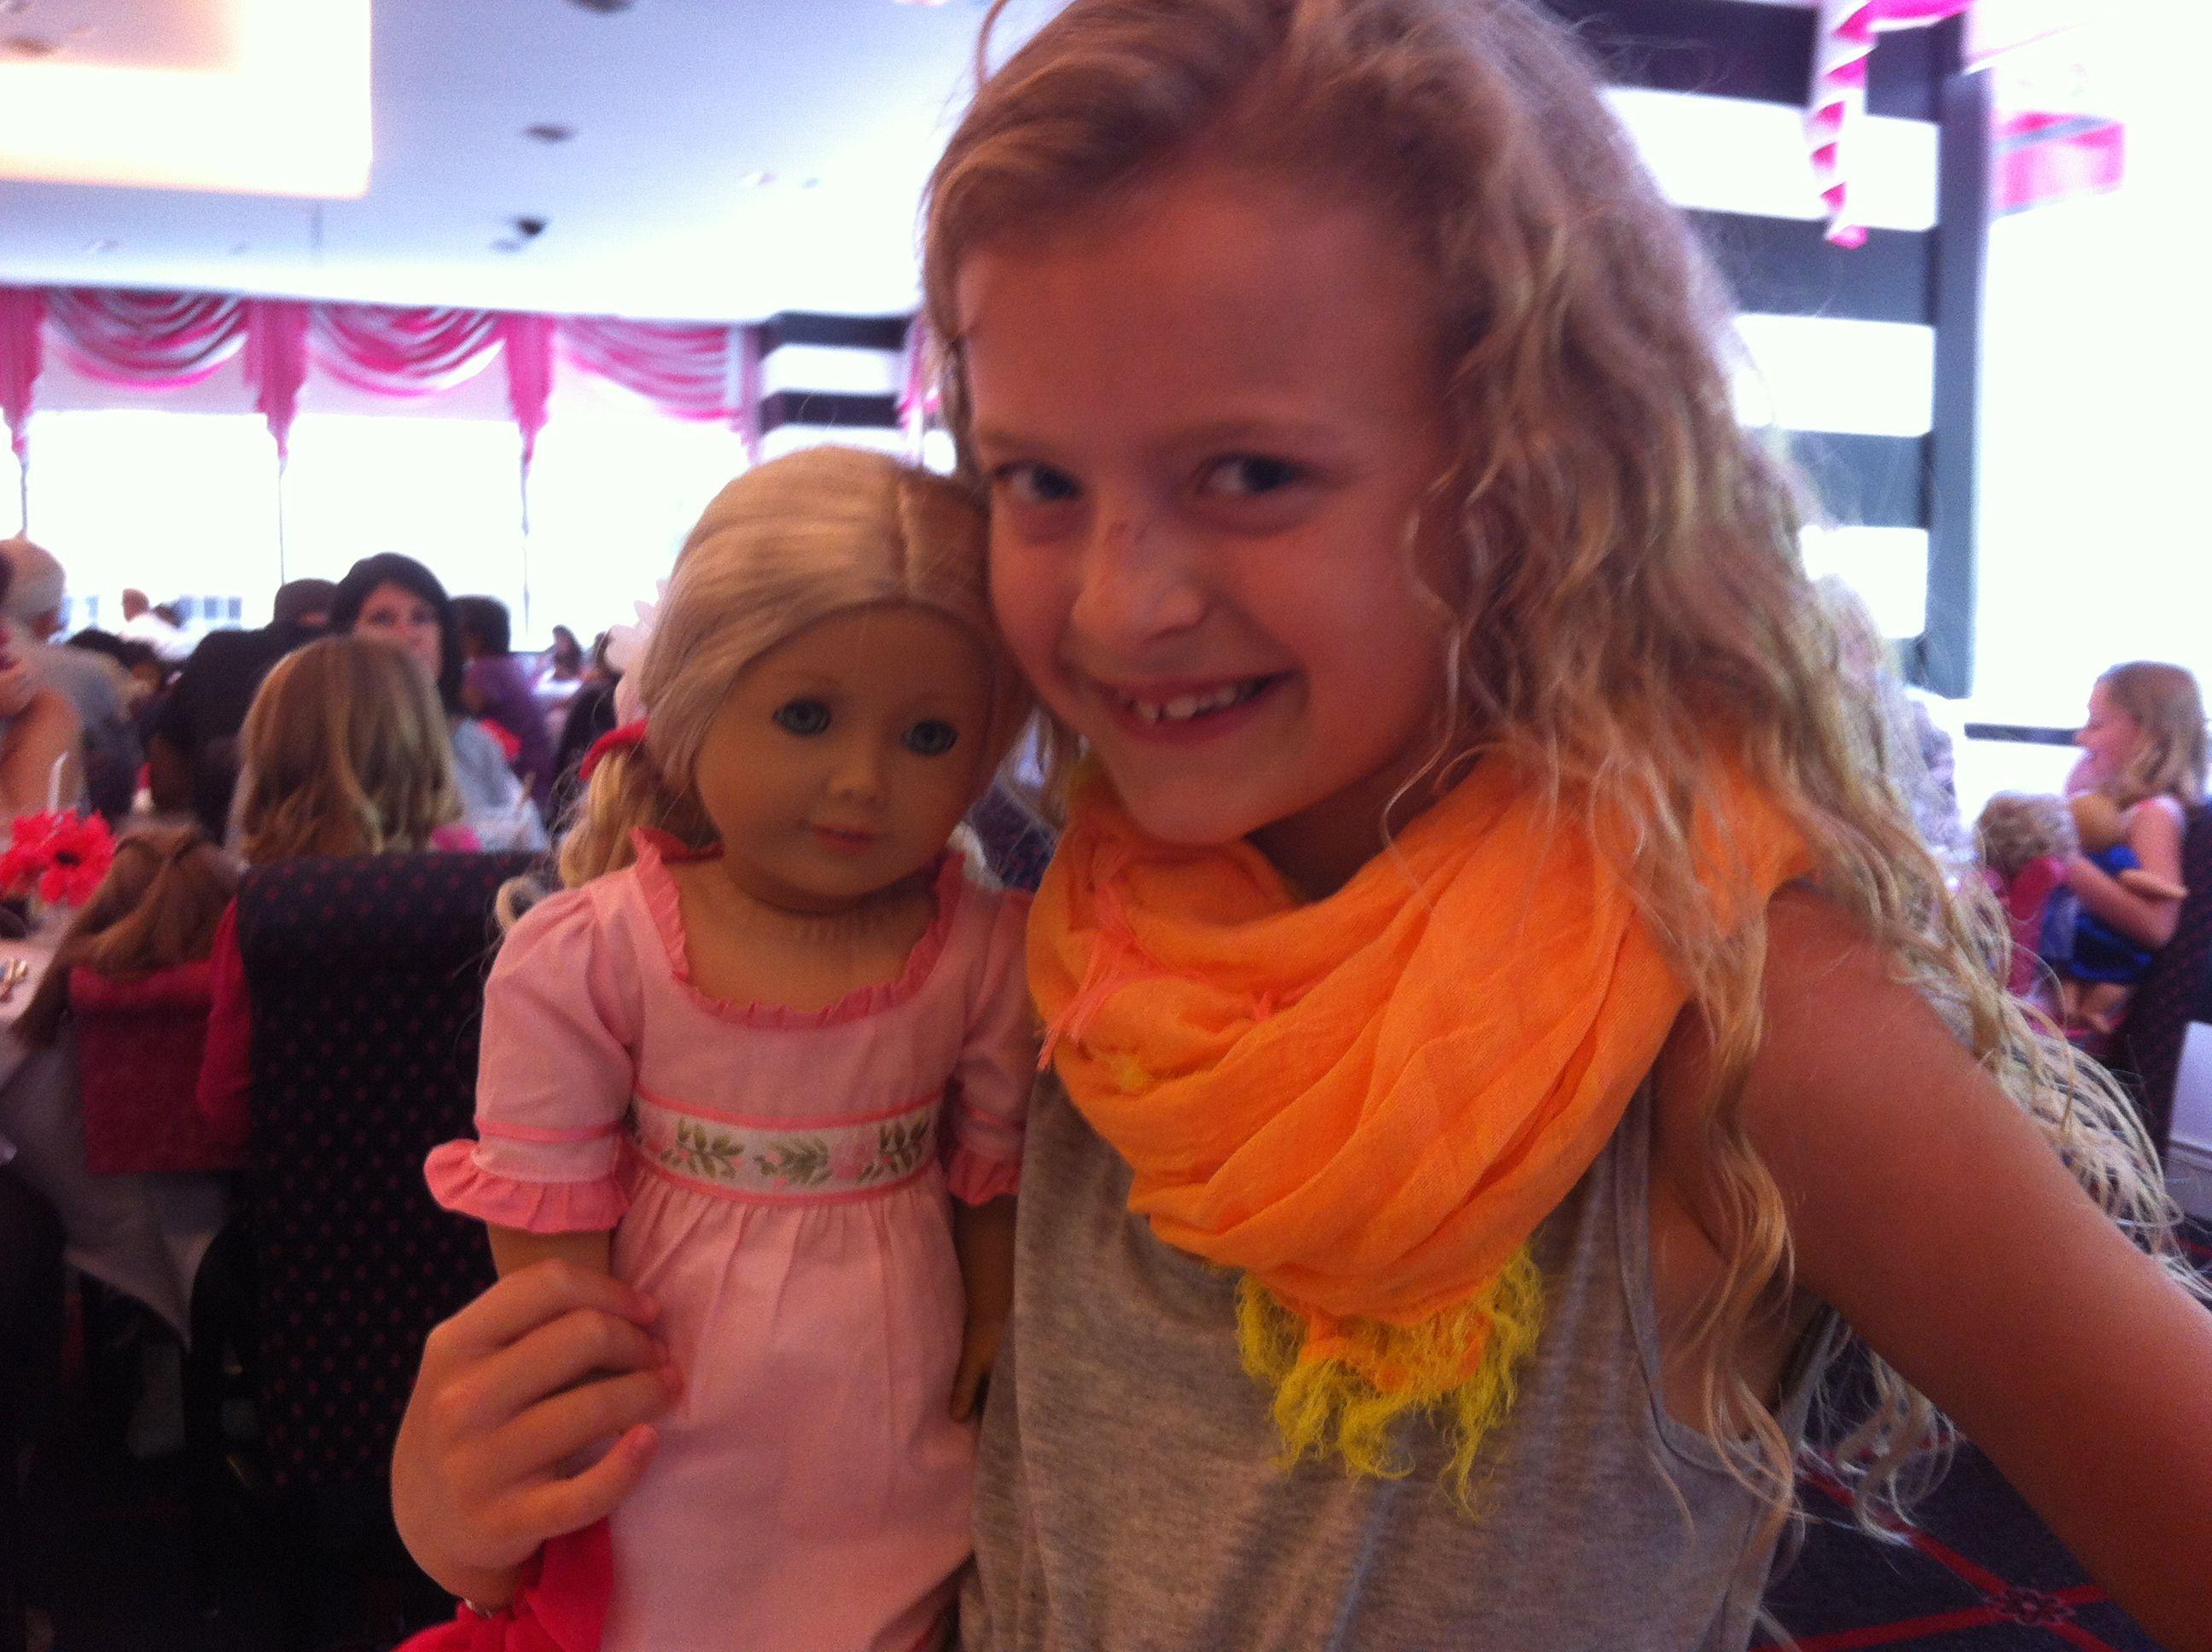 In chigo at amirican girl doll